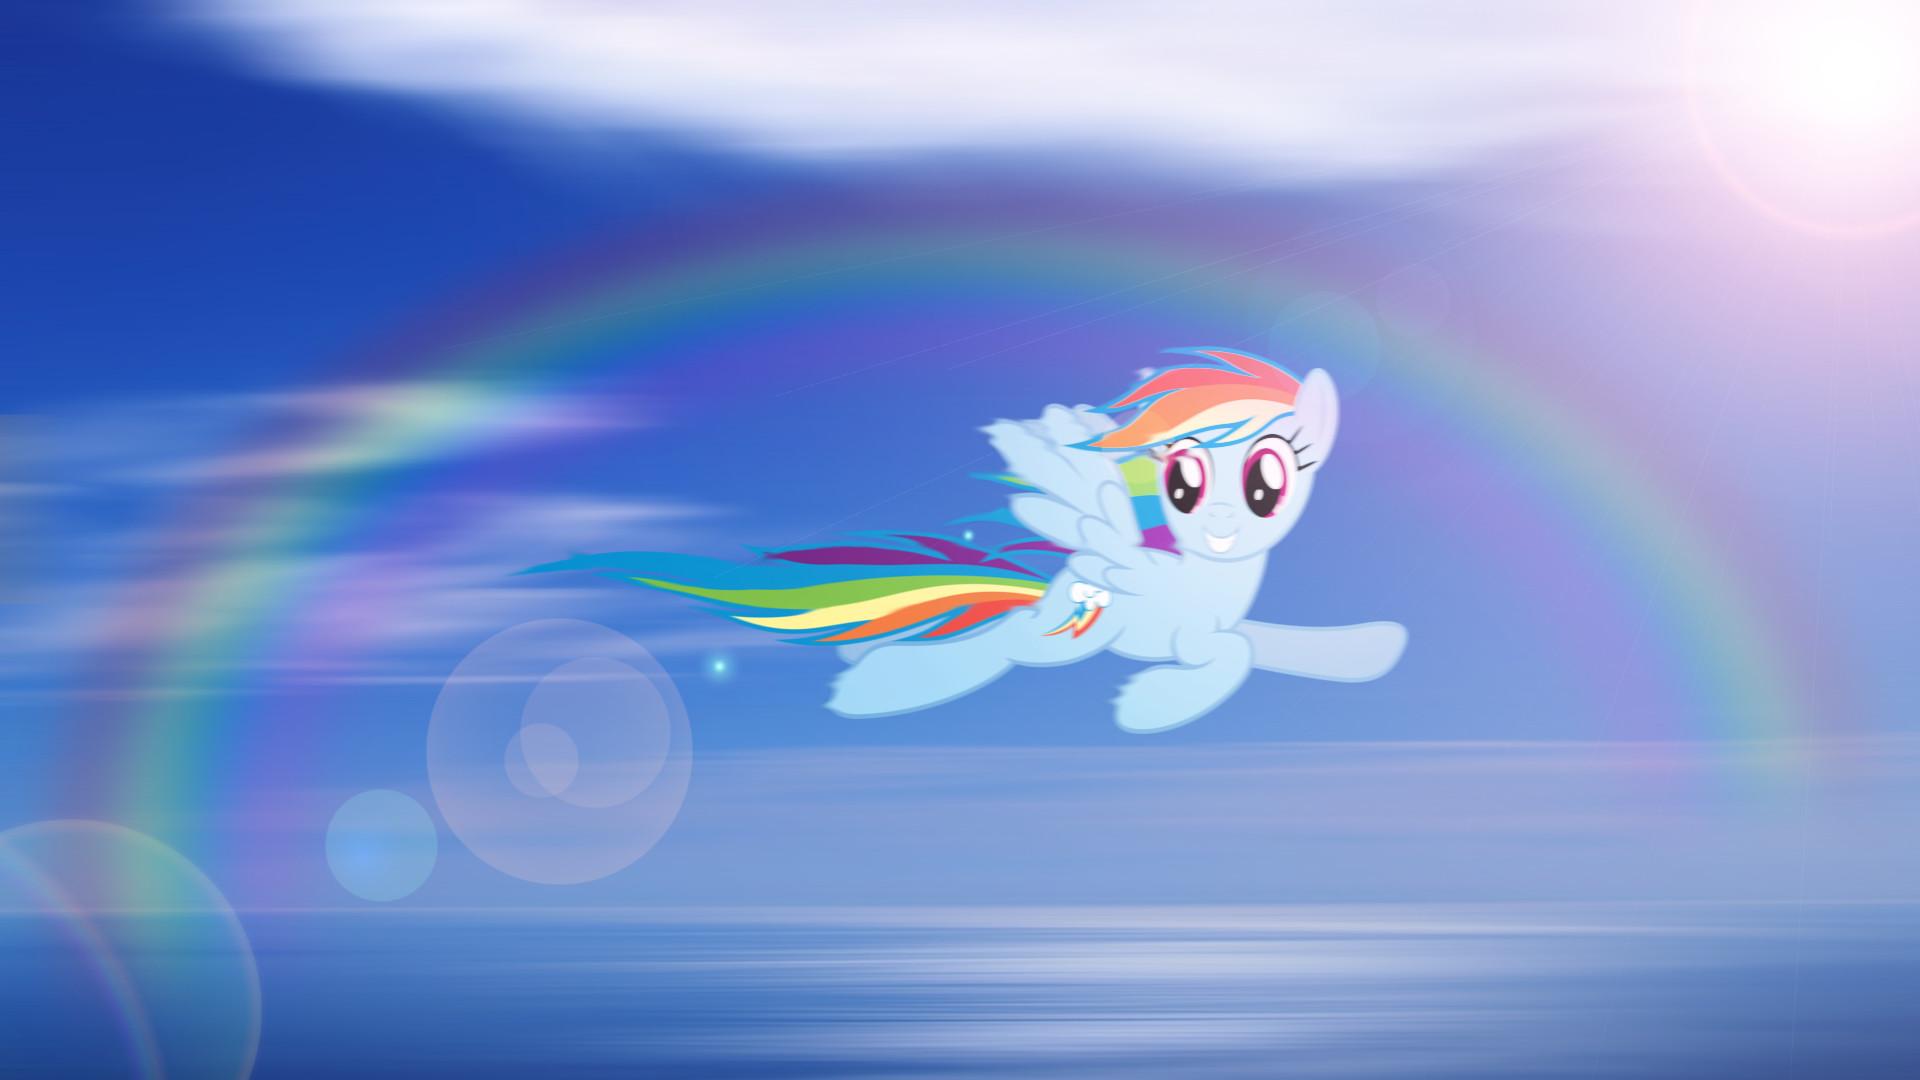 Rainbow Dash HD Wallpaper by TheArsonistMonkey on DeviantArt